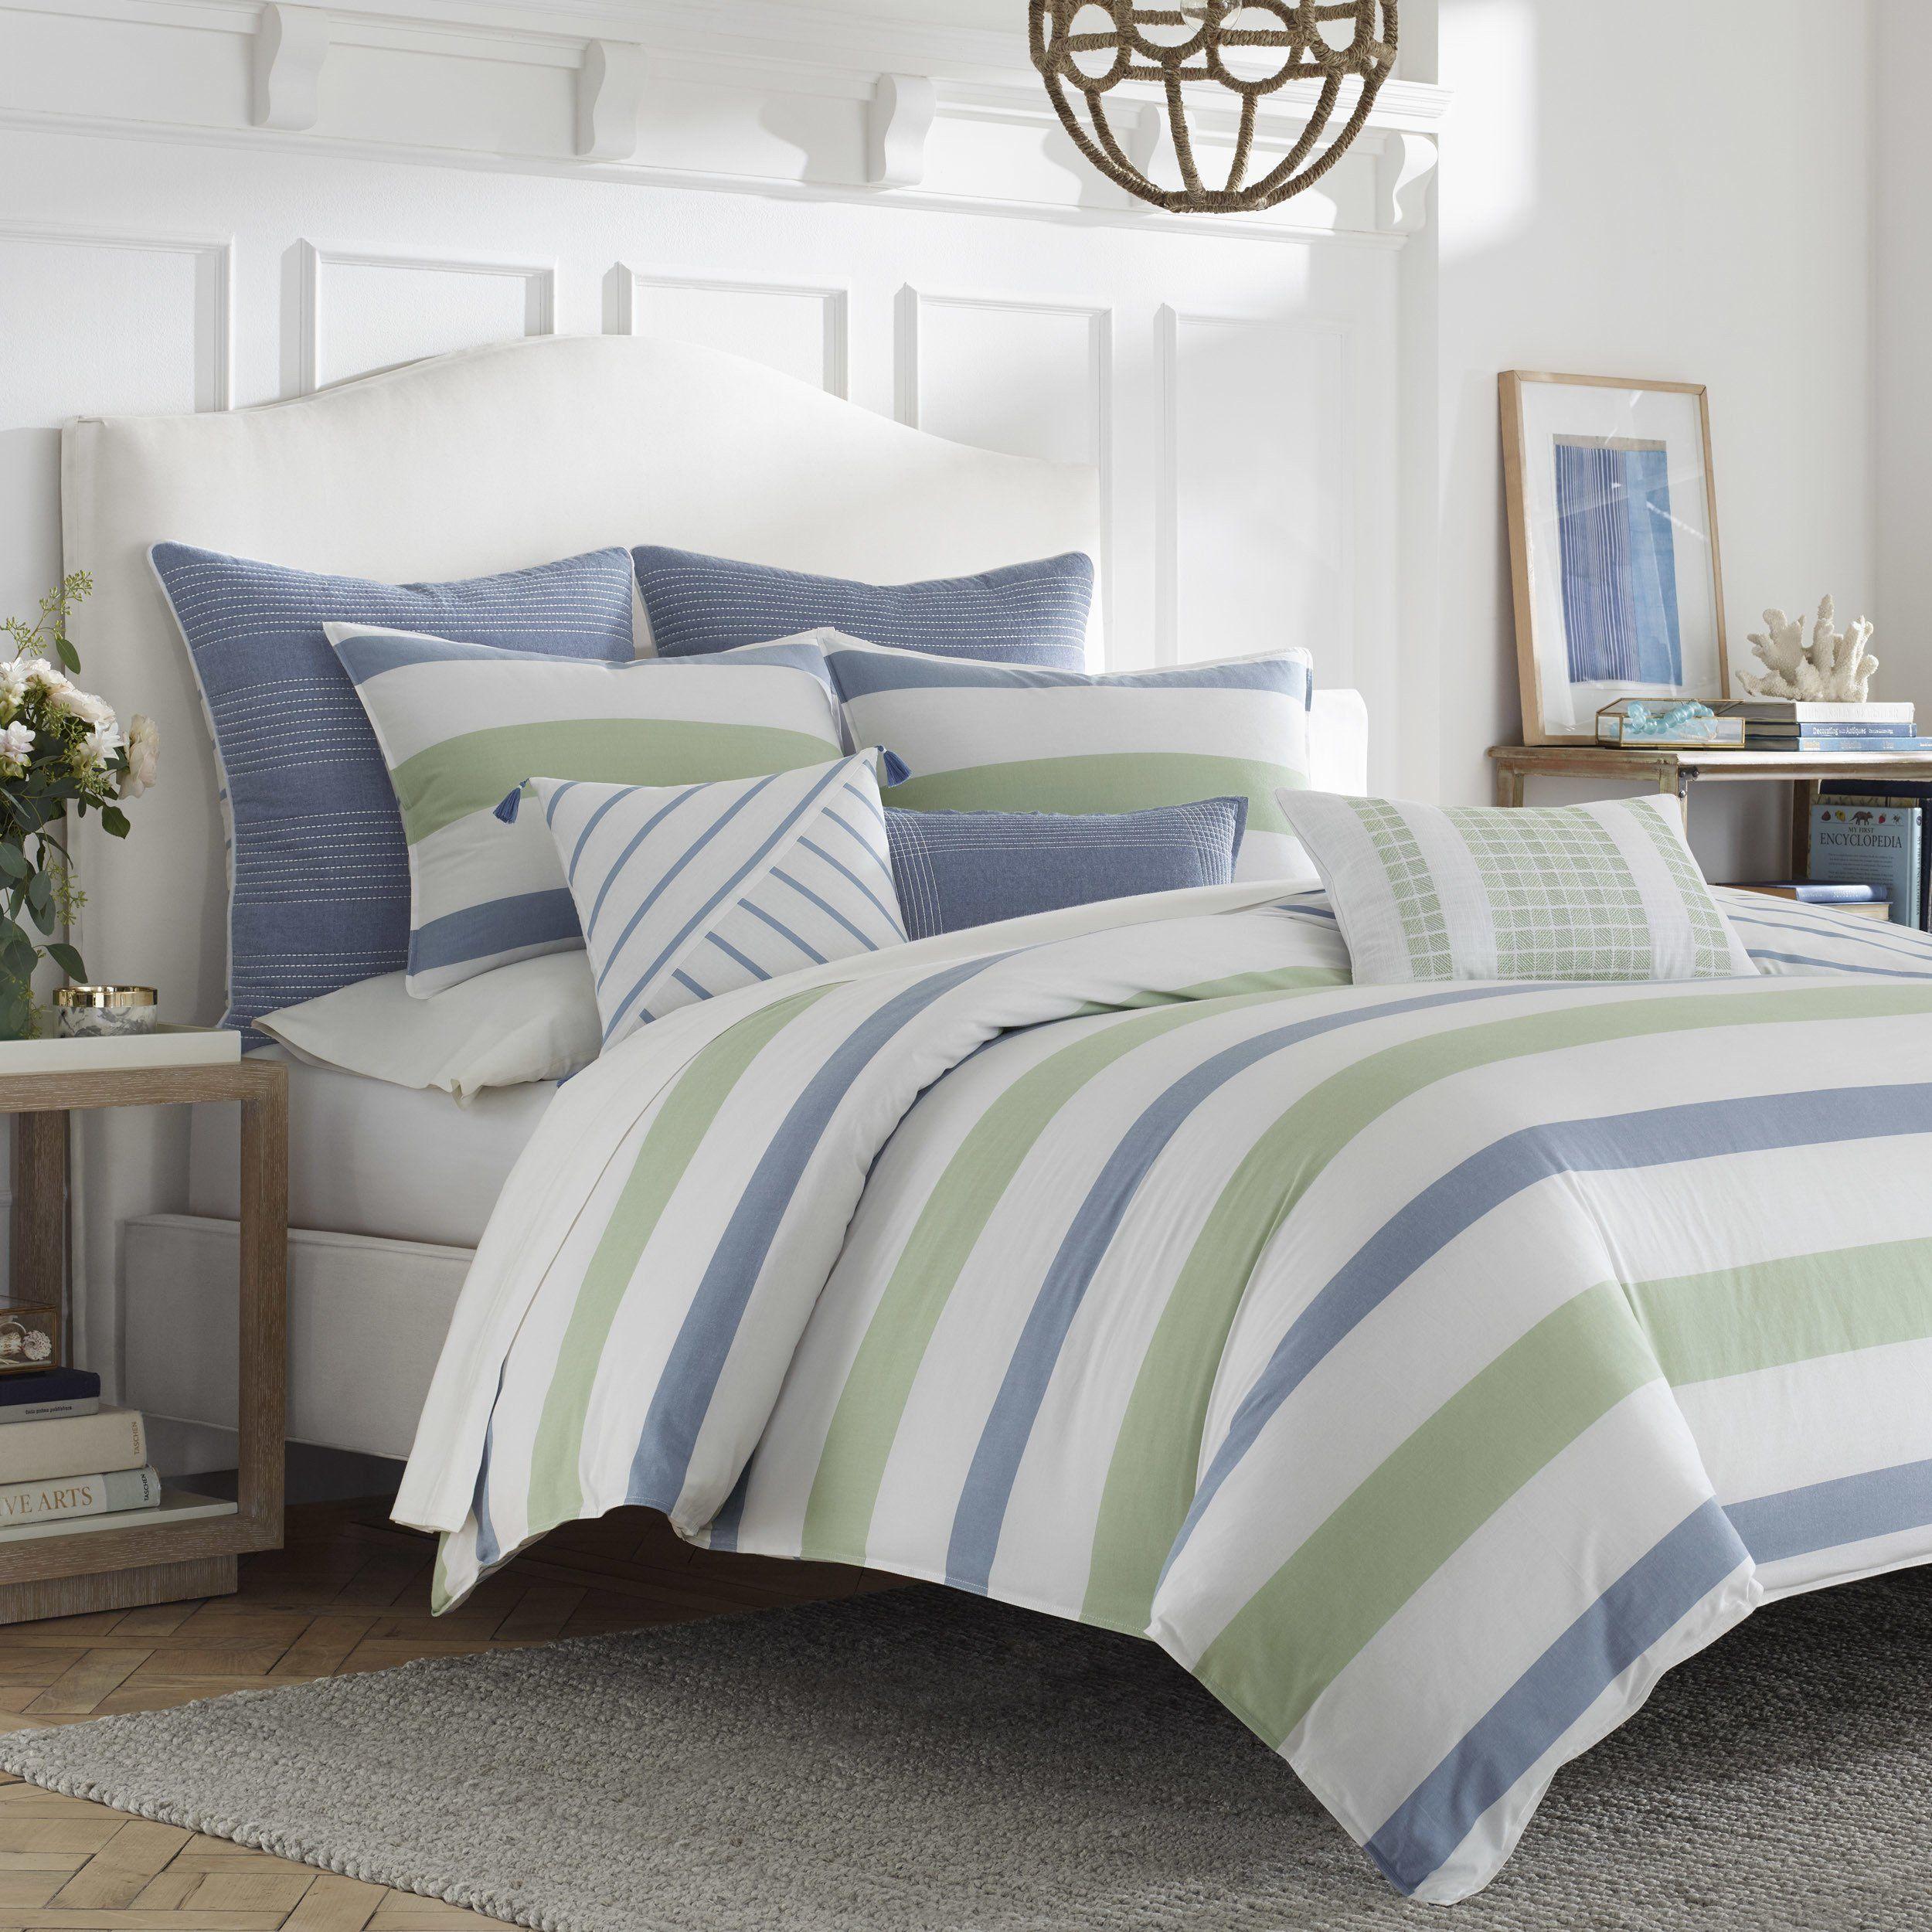 Nautica Norwich Comforter Set King Size Blue 3 Piece As Is Item King Blue 3 Piece Comforter Sets Blue Comforter Blue Comforter Sets